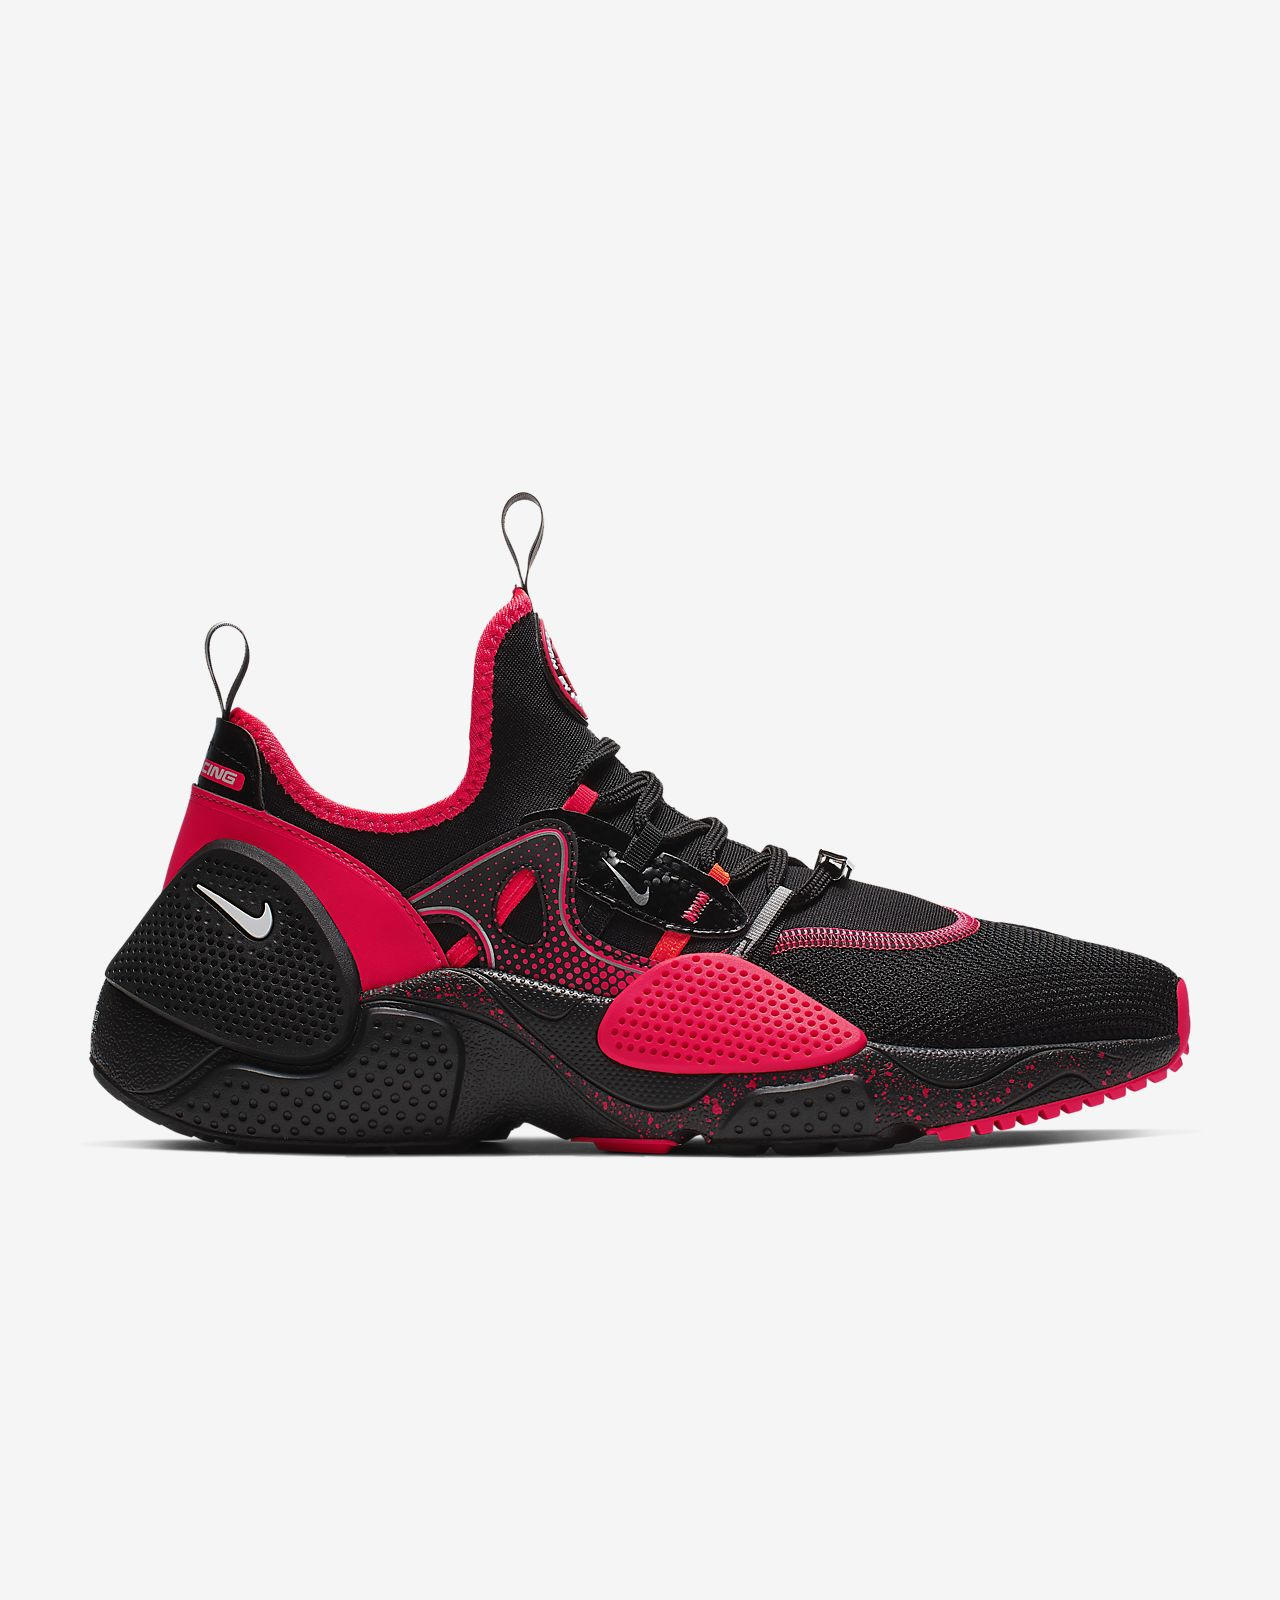 half off 923b5 a41eb Low Resolution Nike Huarache E.D.G.E. Men s Shoe Nike Huarache E.D.G.E.  Men s Shoe